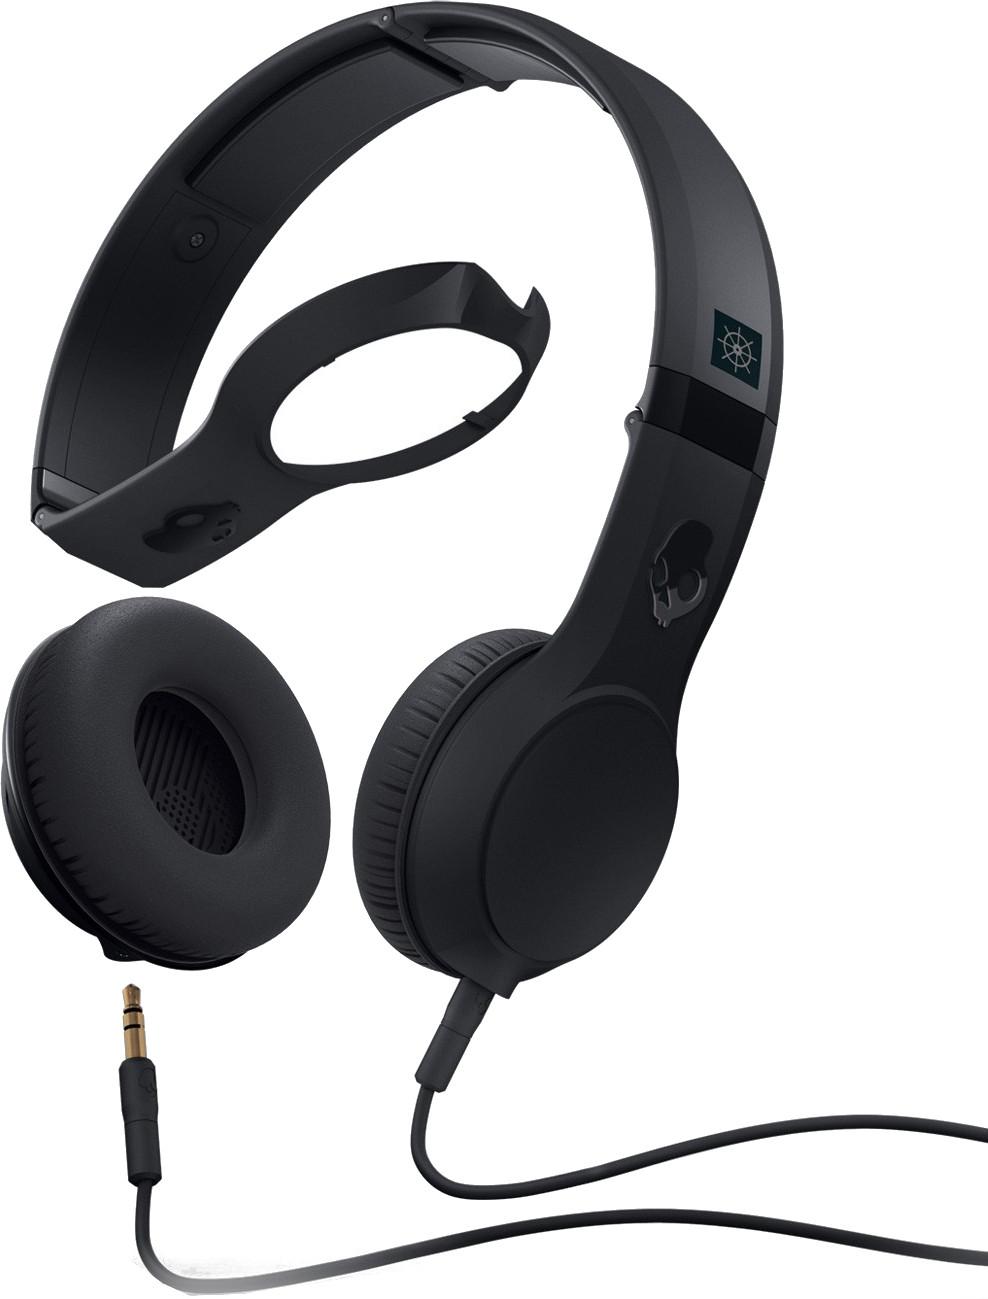 Skullcandy Cassette Headphones With Mic In Black 878615038349 Ebay Headphone Jack Wiring Diagram